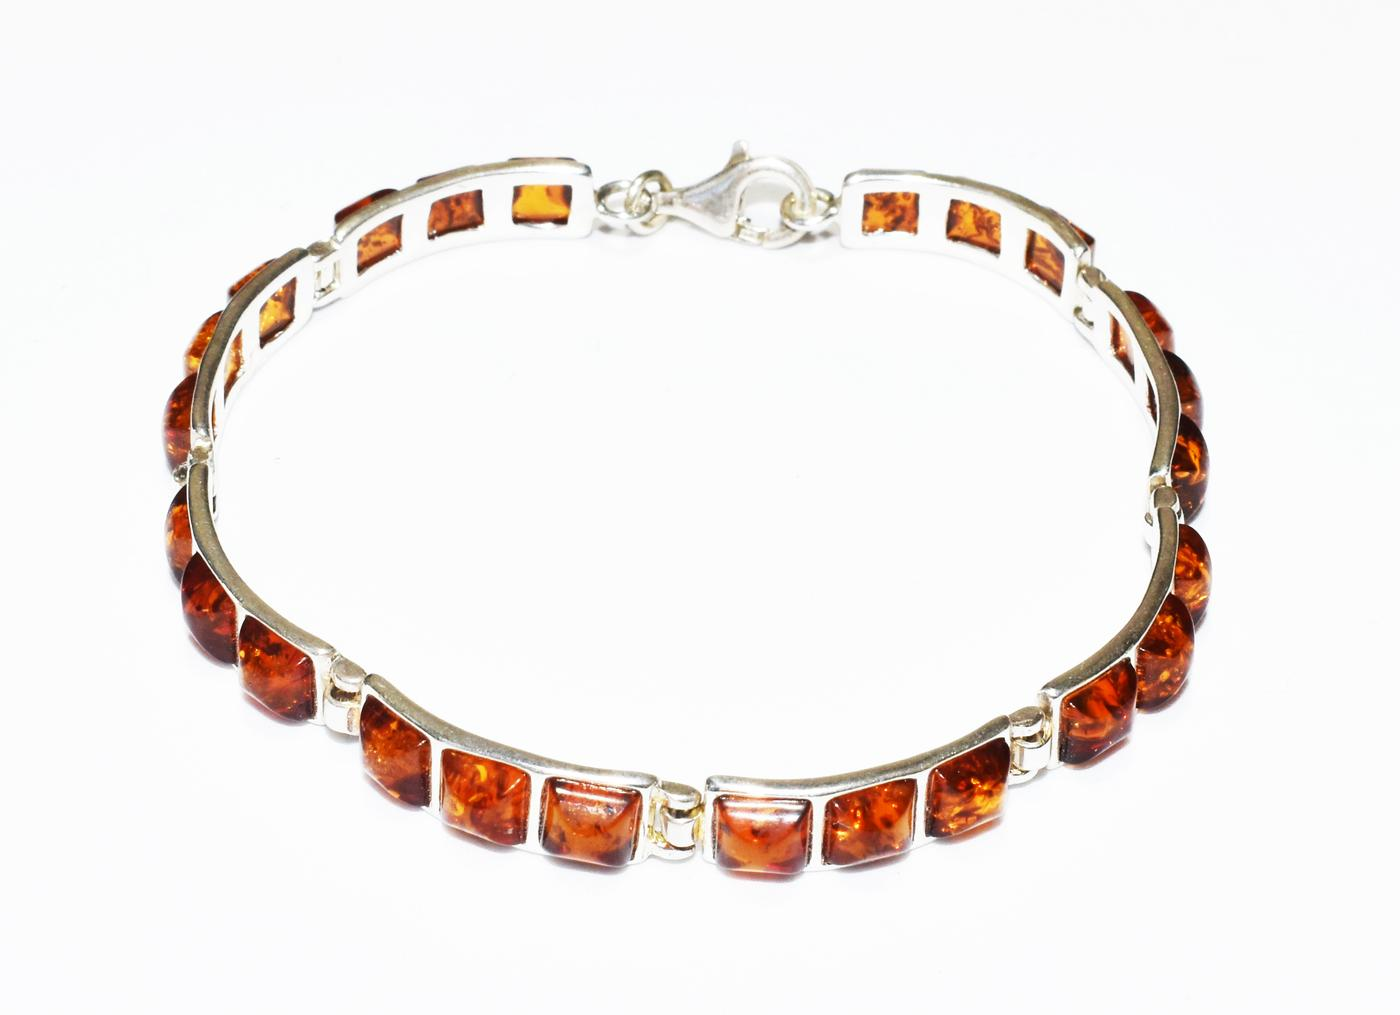 Rectangular Baltic amber and silver bracelet